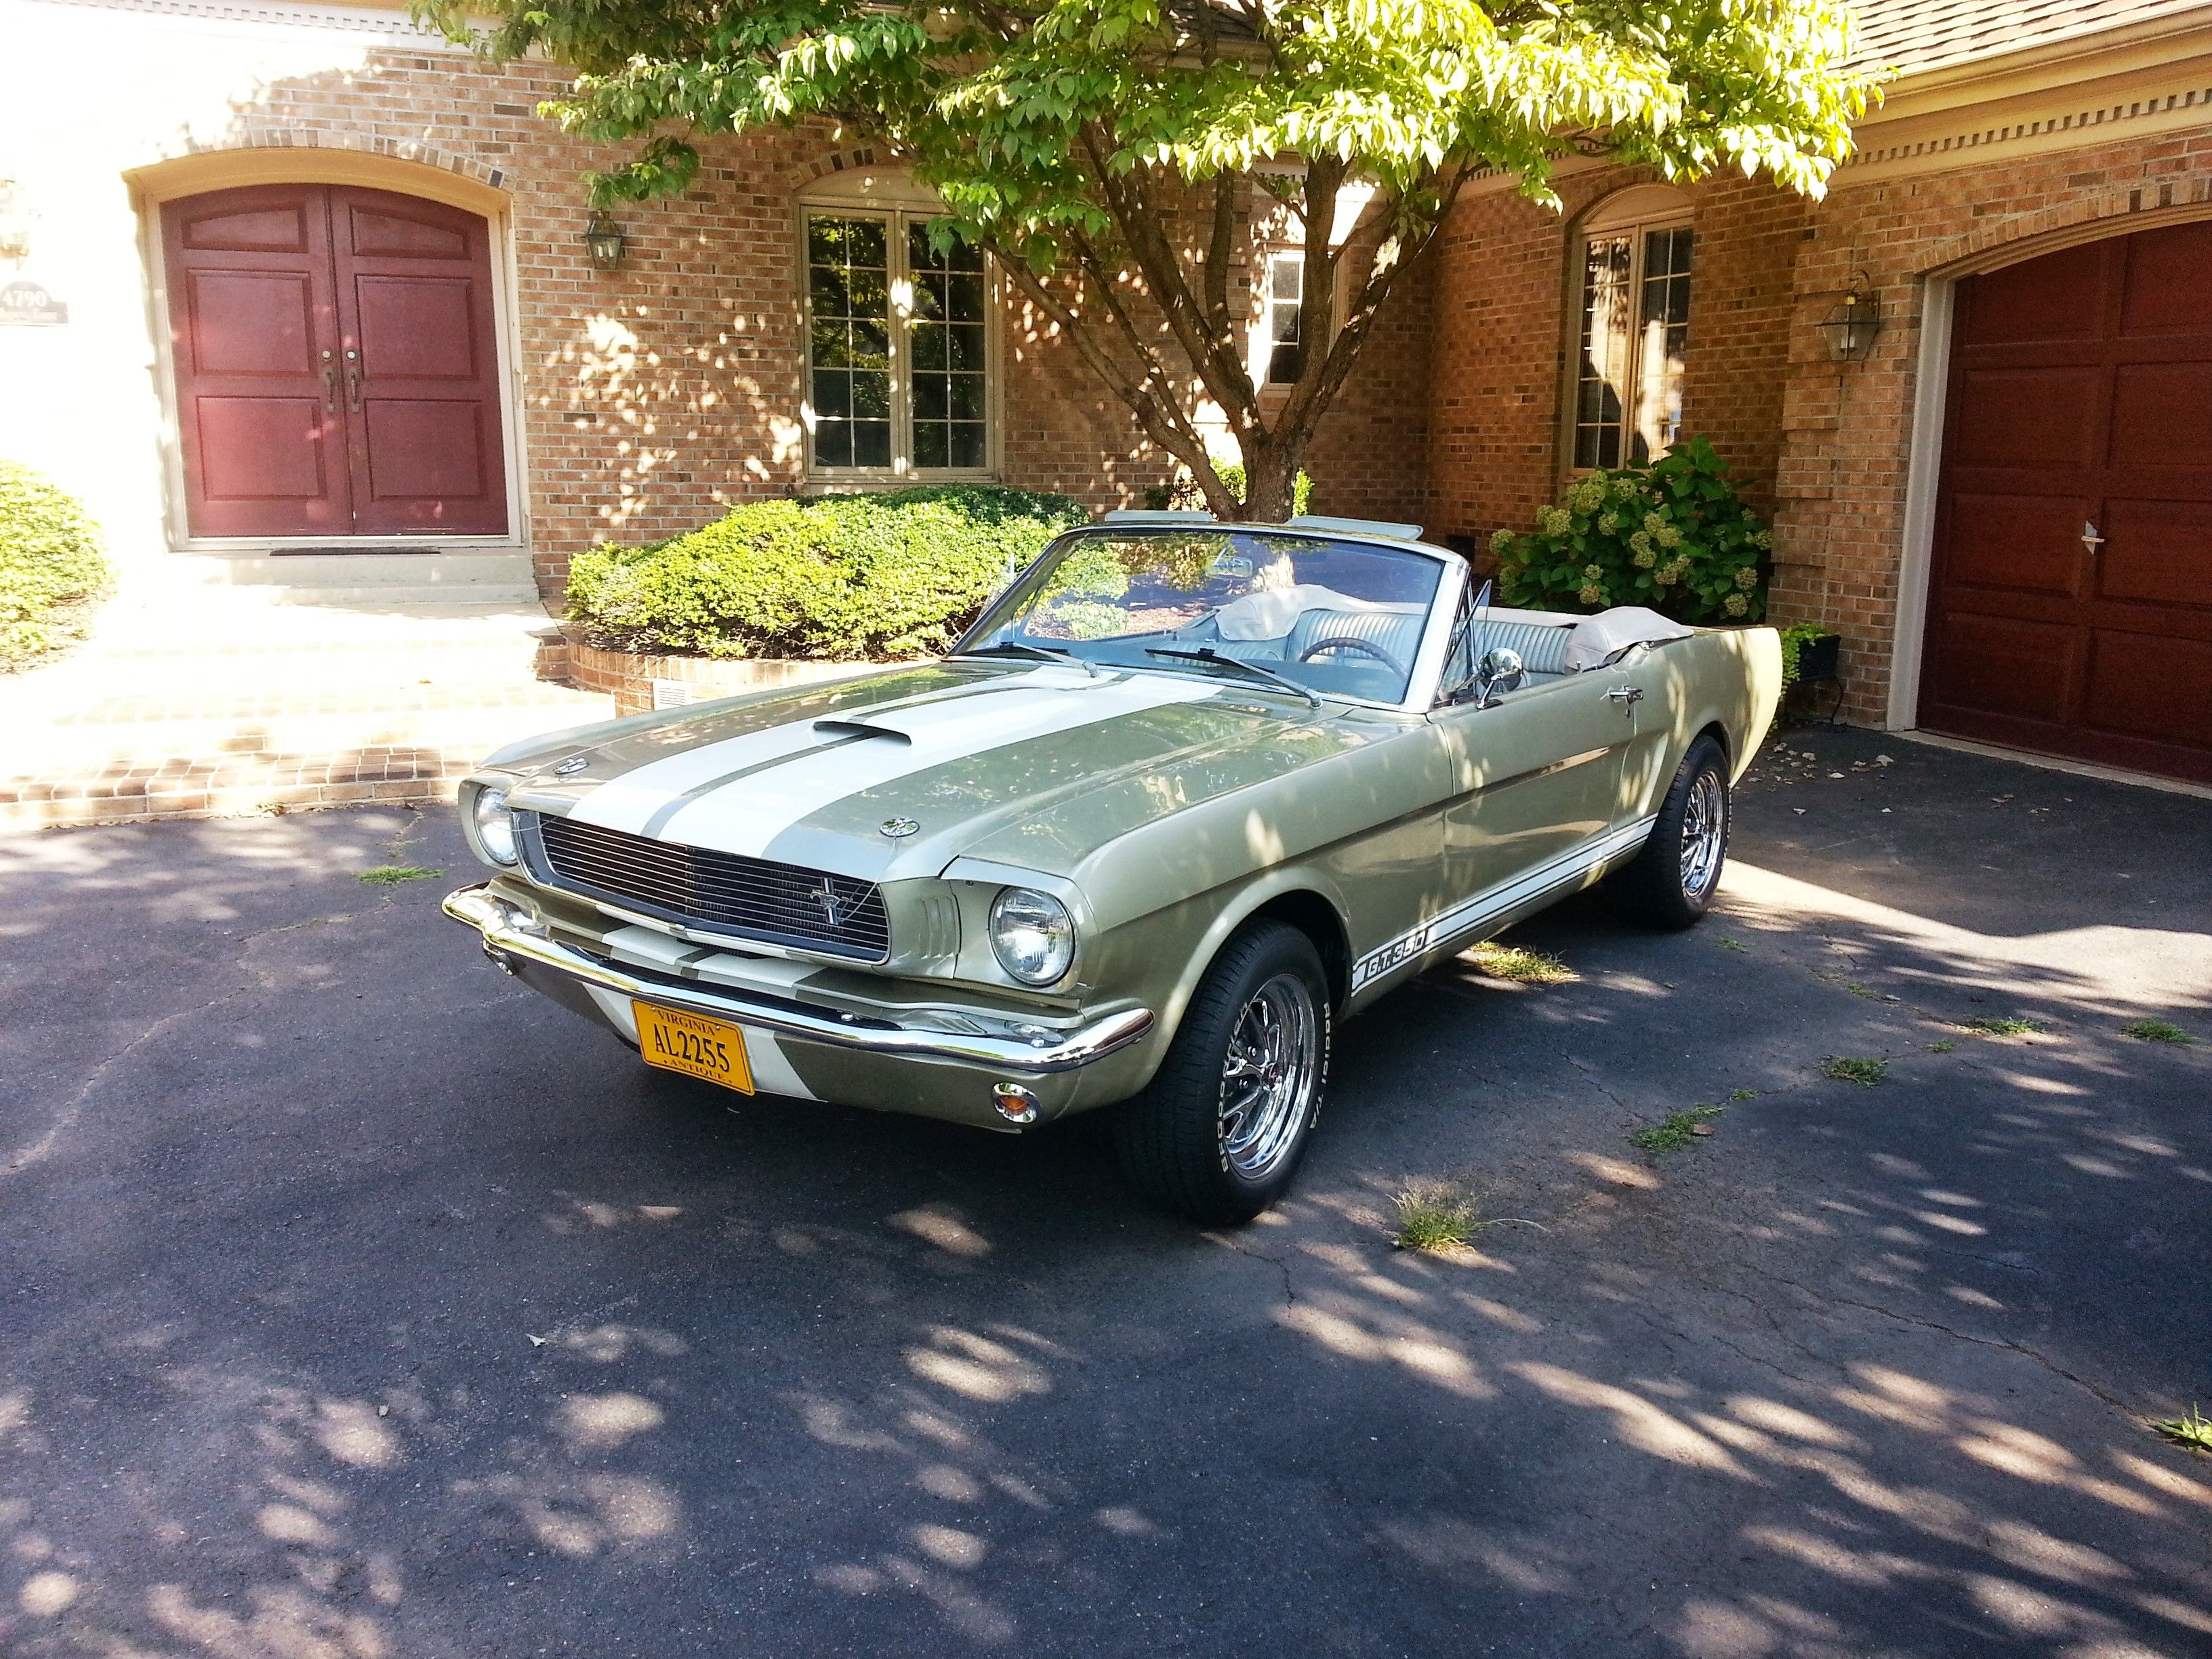 1966 Mustang Convertible GT350 (Clone) Engin